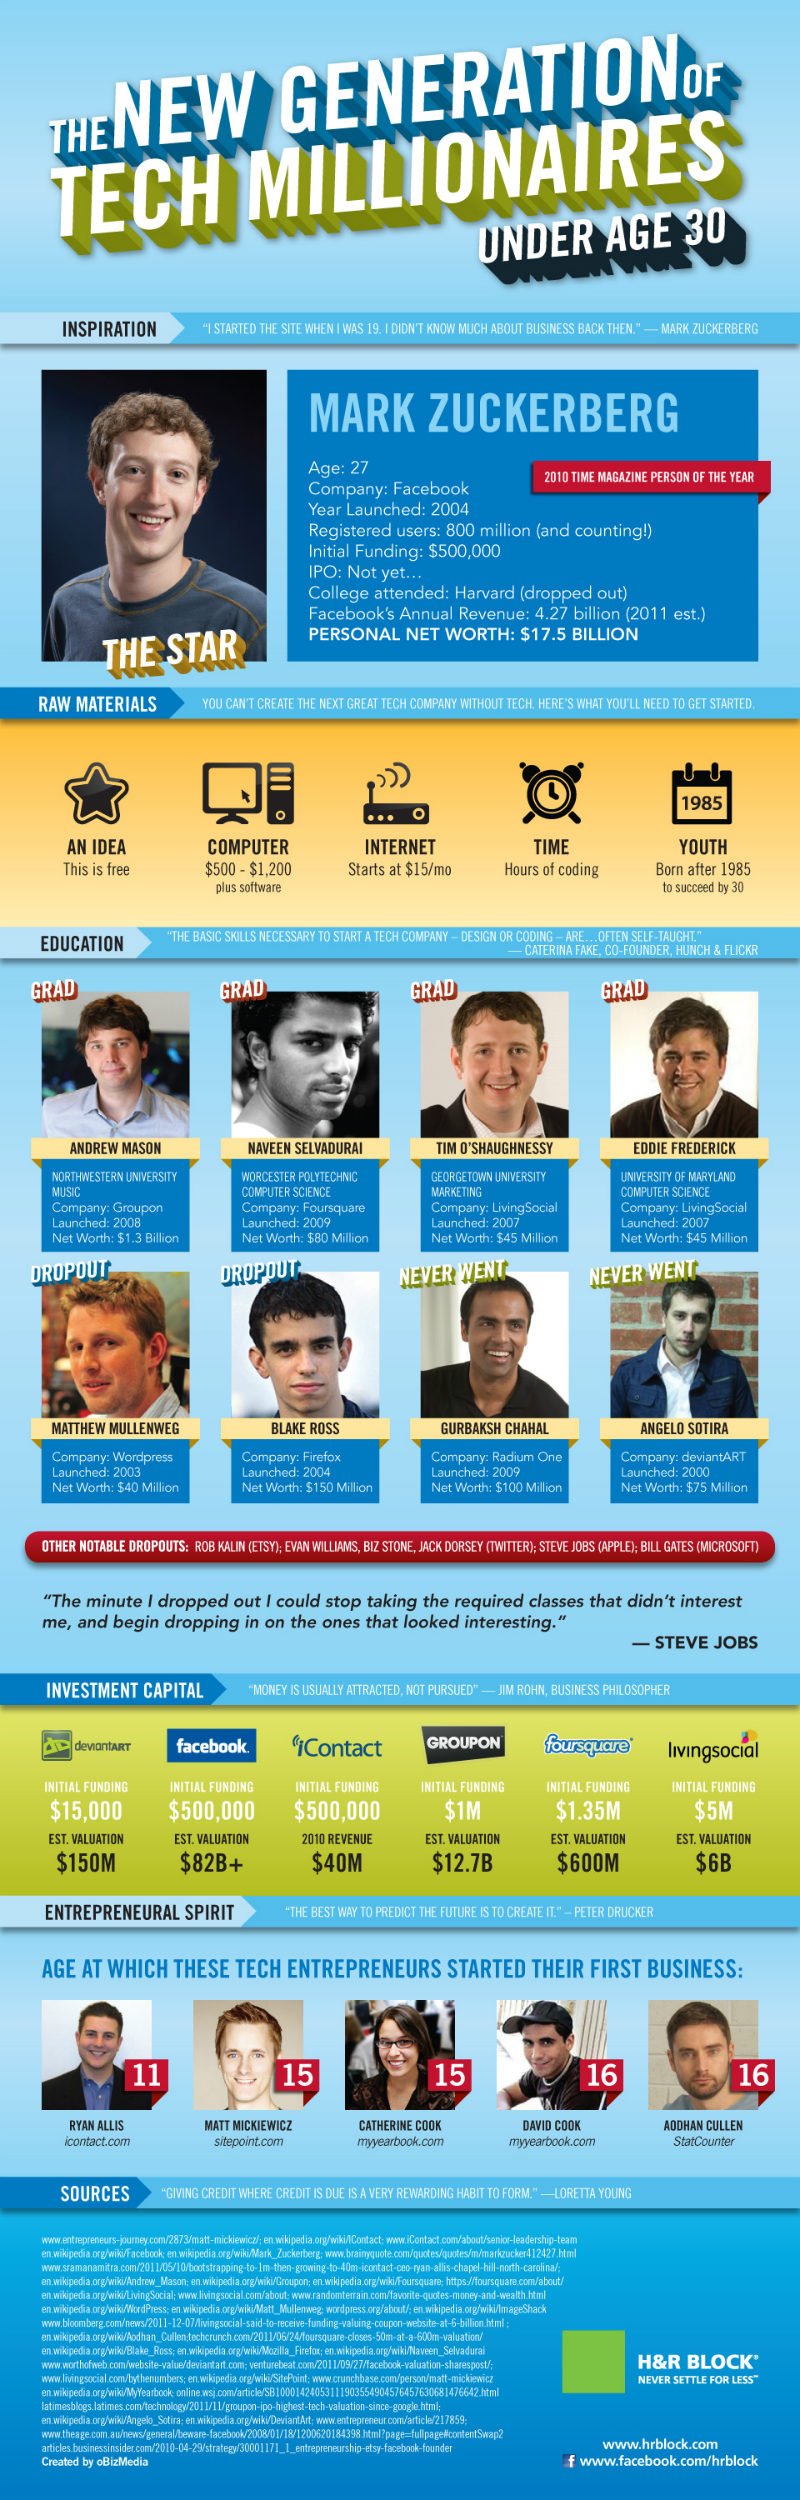 Новото поколение технологични милионери [Инфографика]